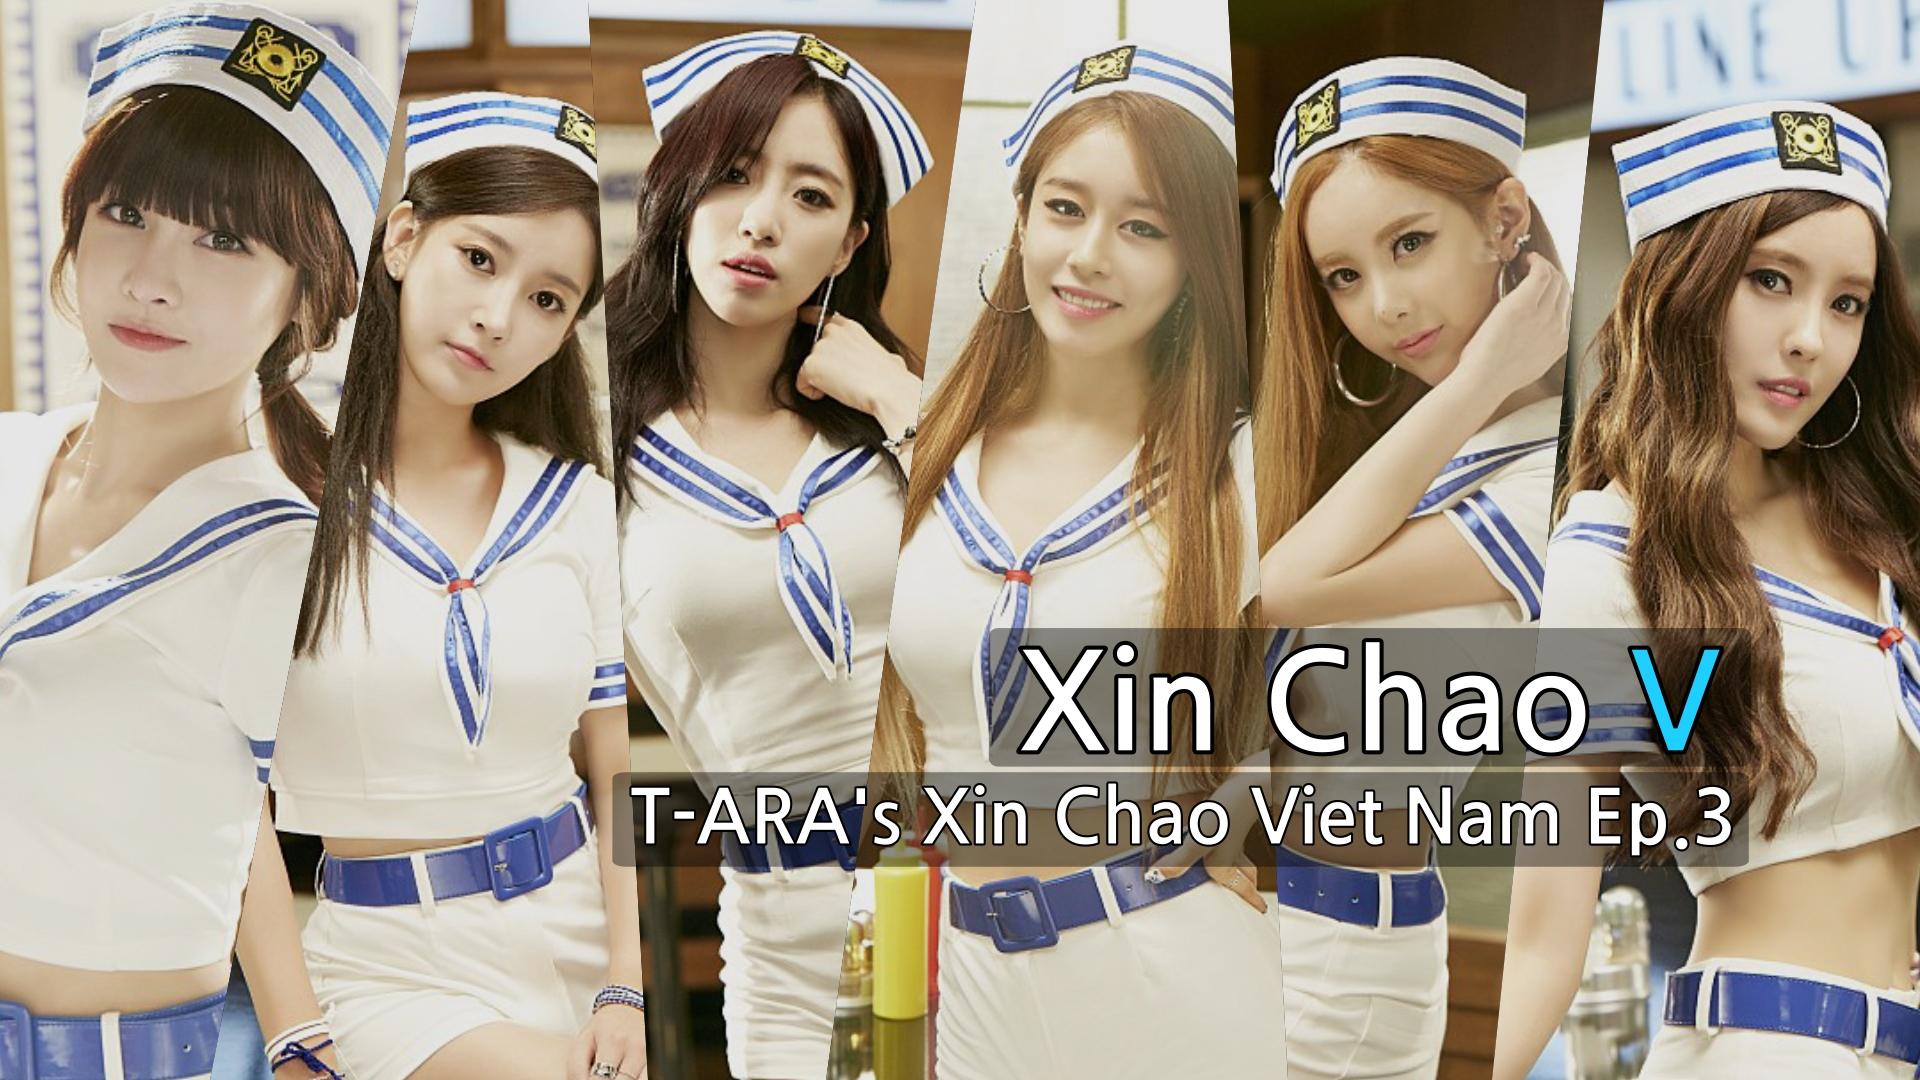 T-ARA's Xin Chao Viet Nam Ep.3